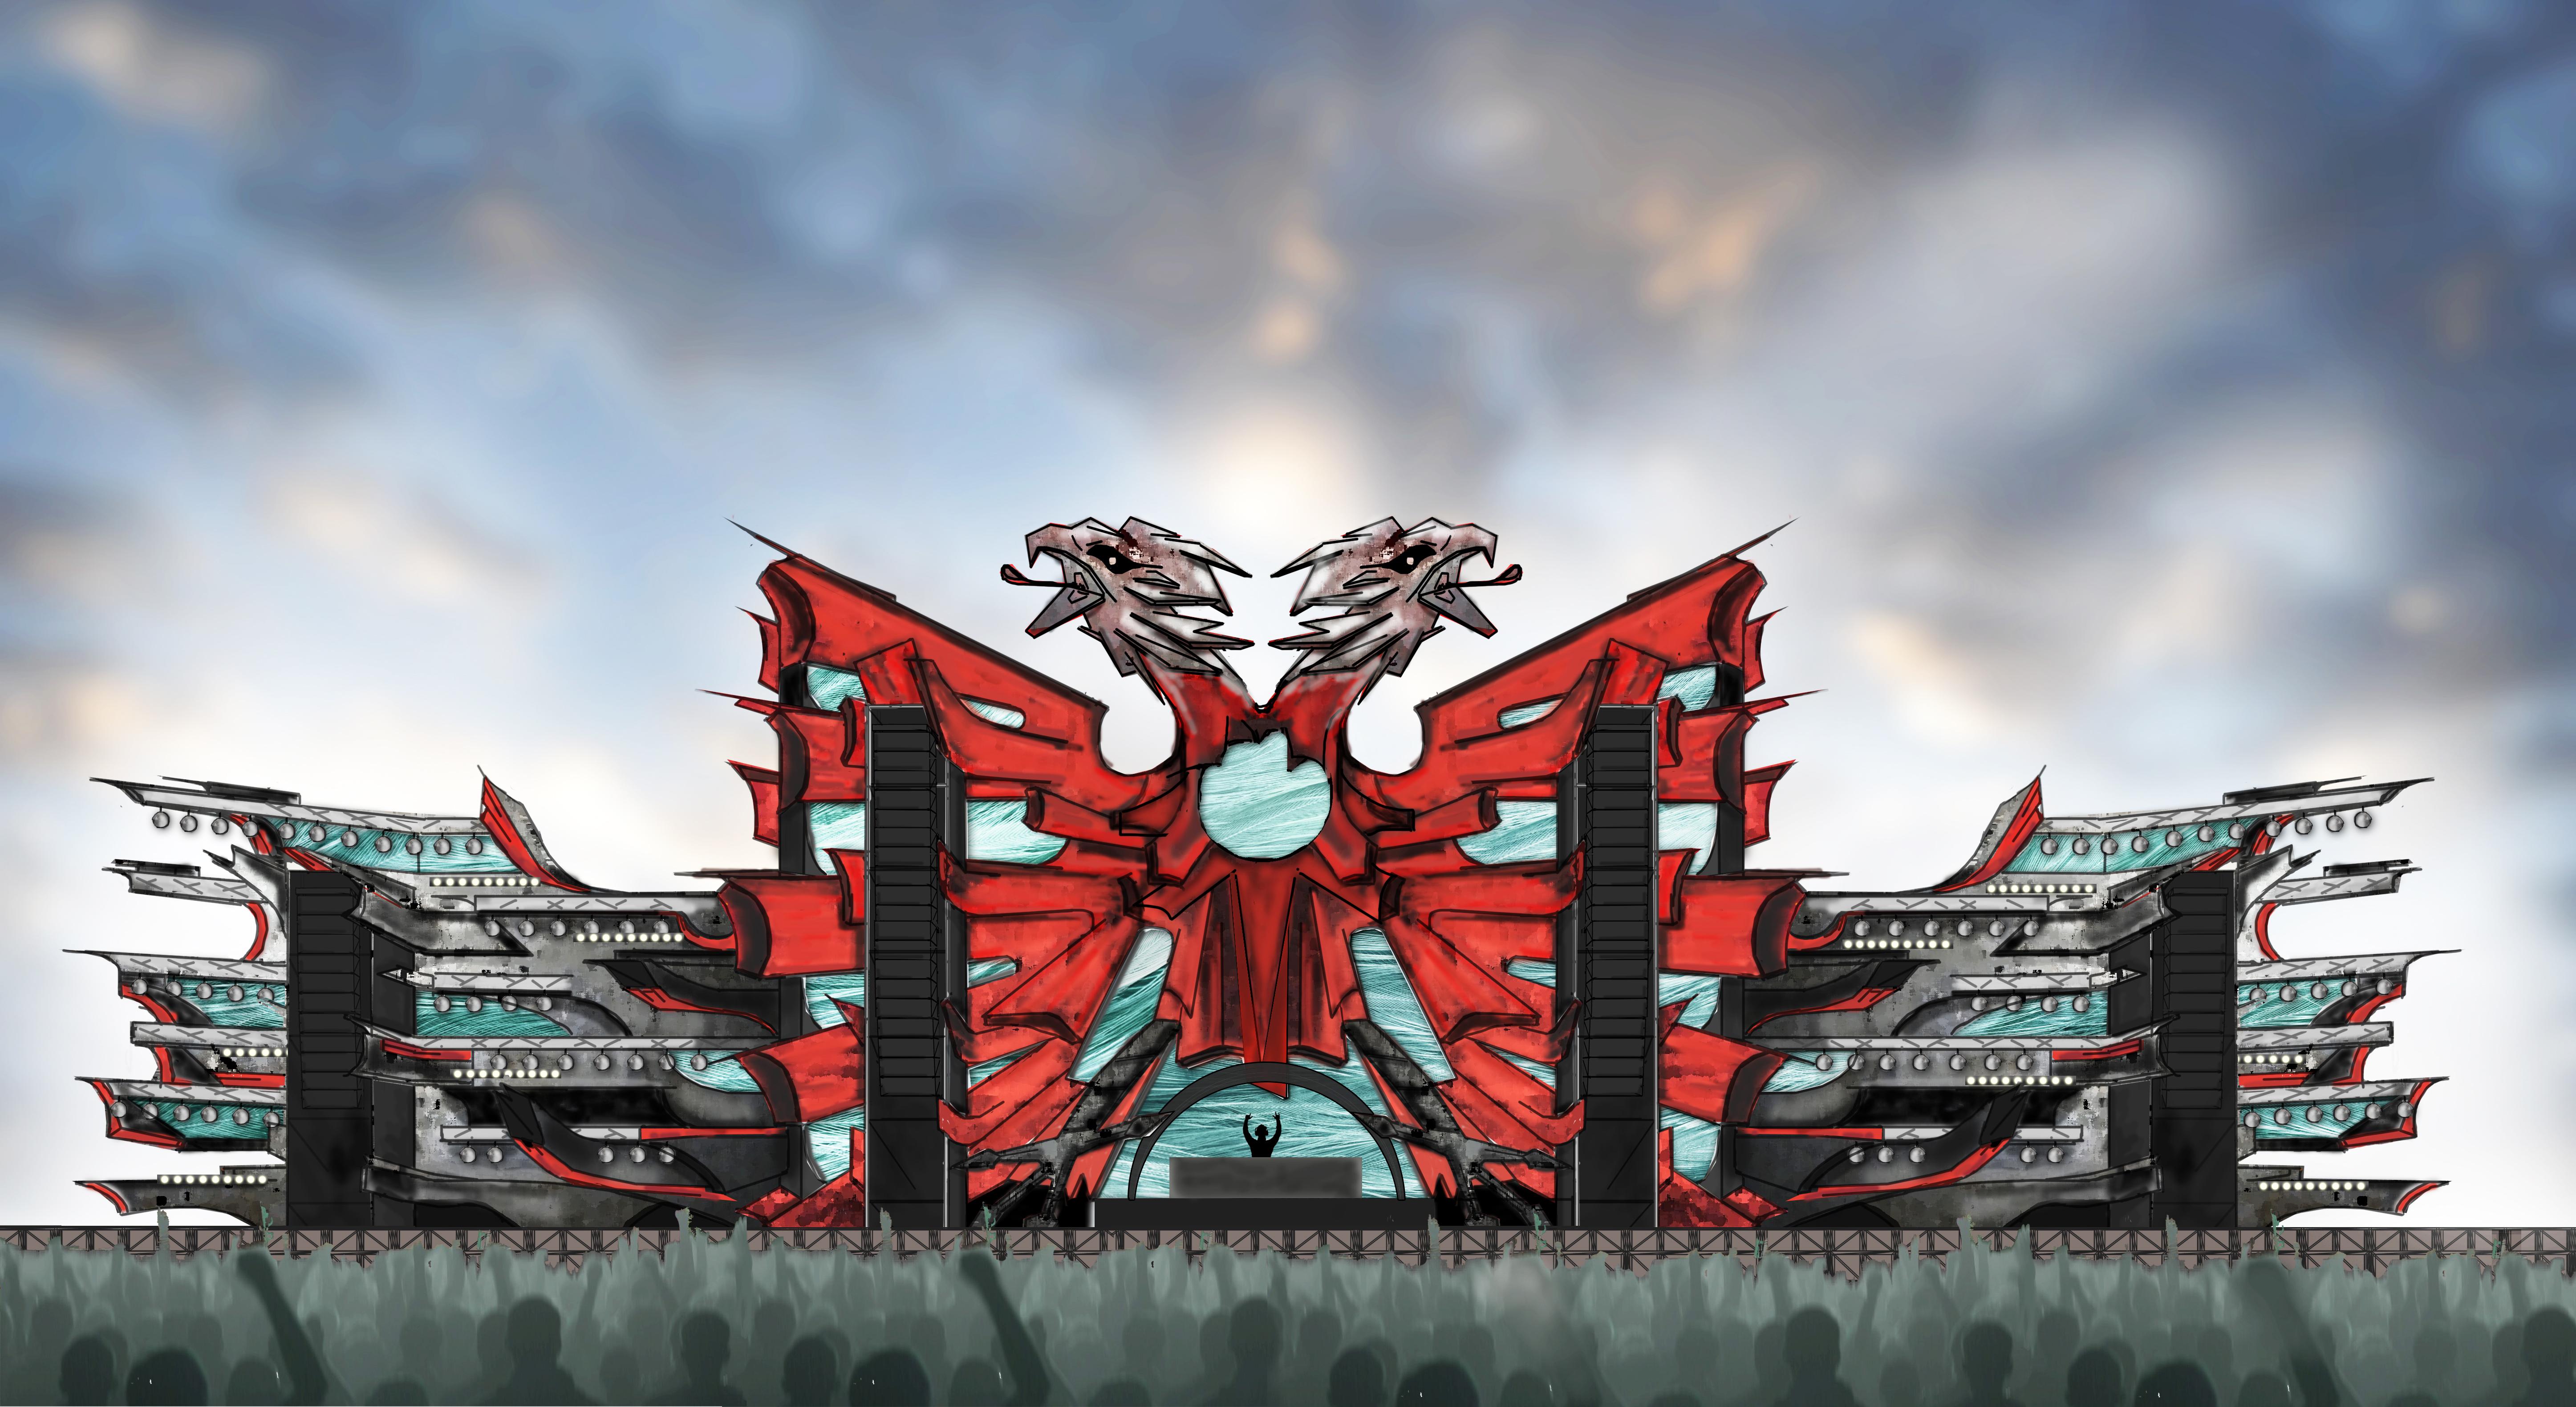 Electric Albania 2018 – Mainstage design